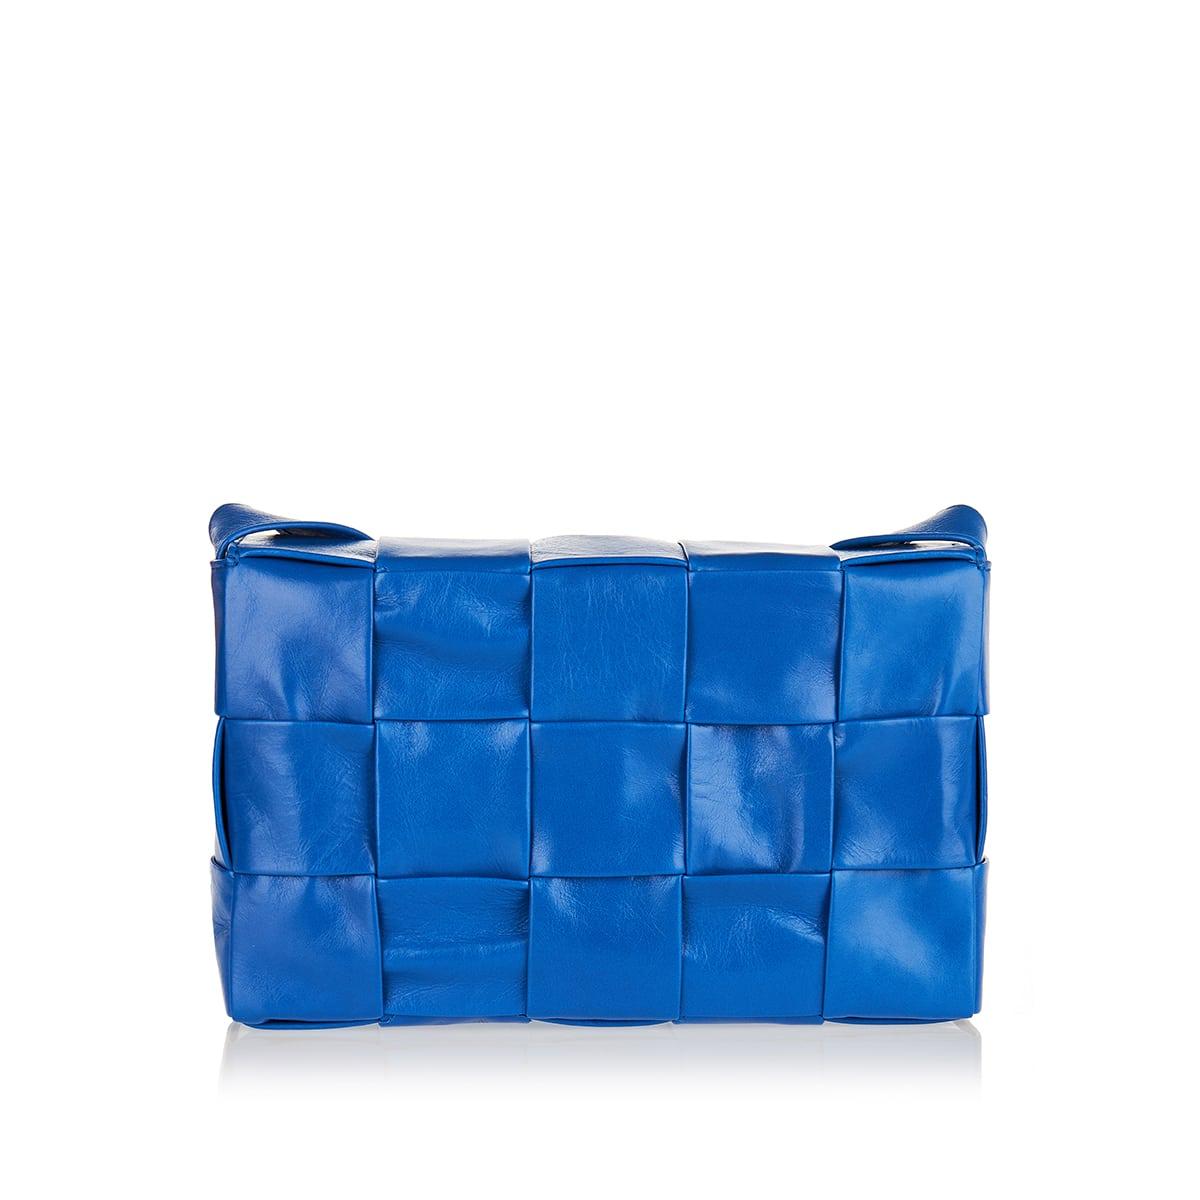 Cassette woven leather bag